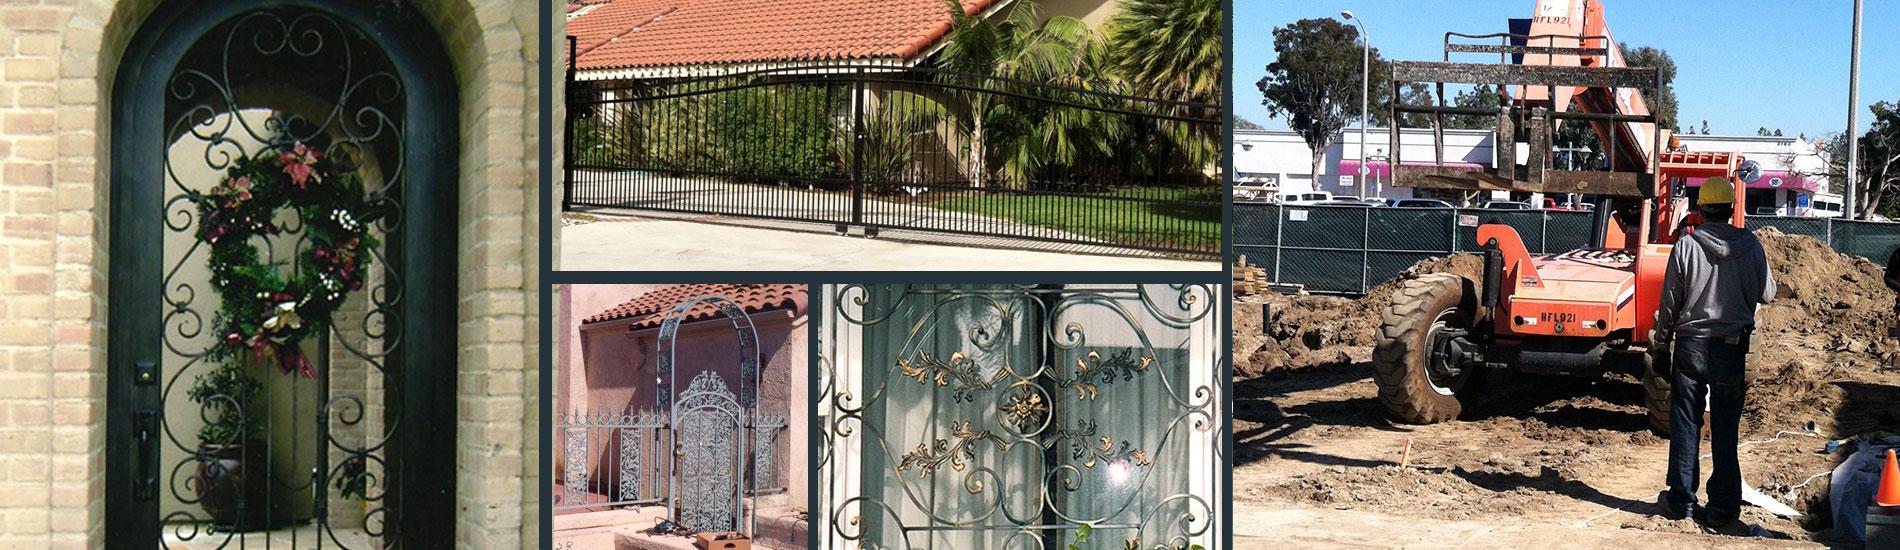 Iron gate, fences, handrails